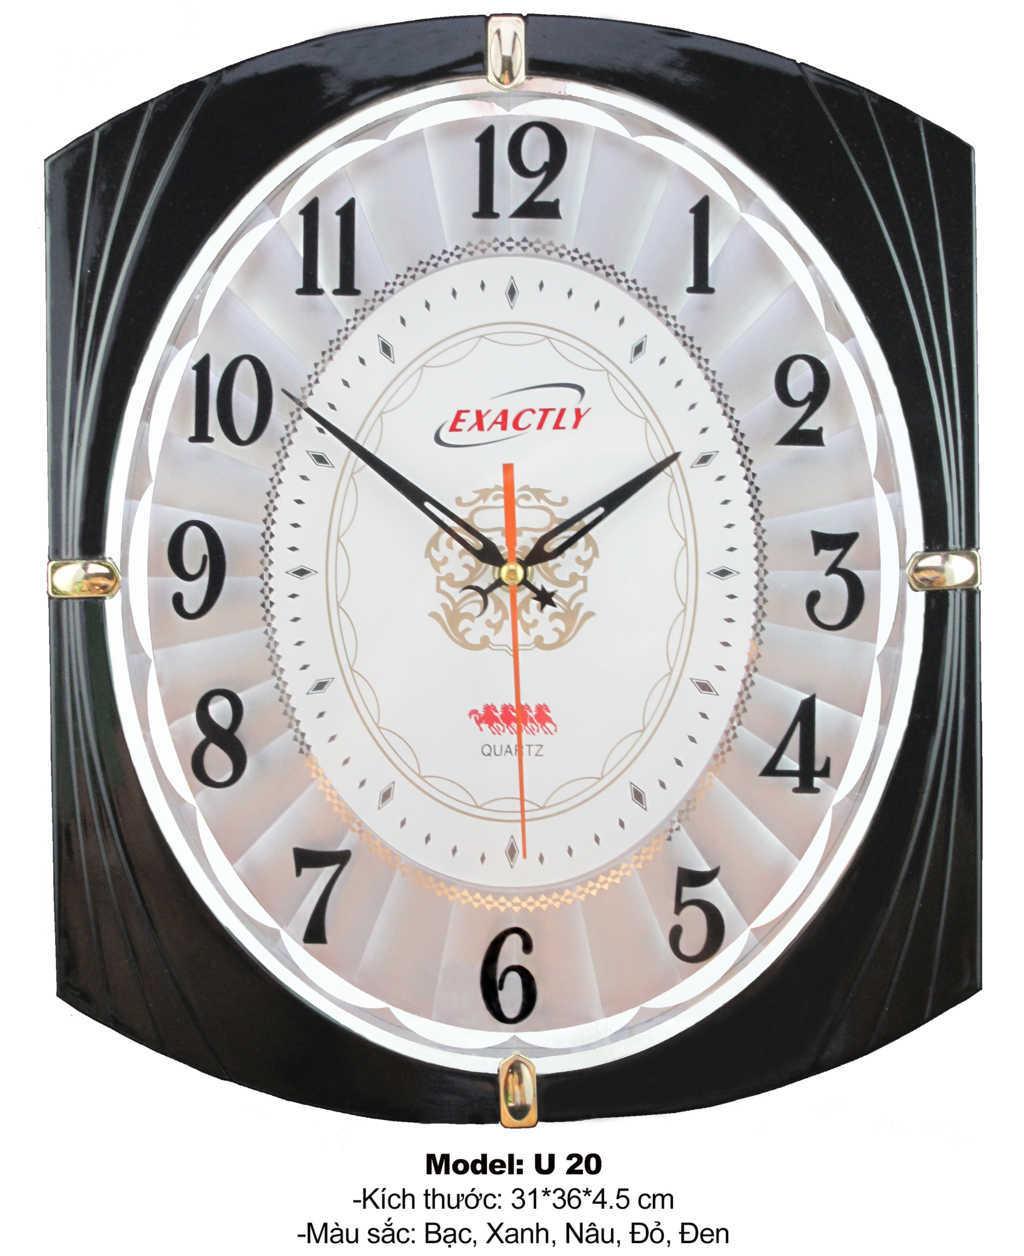 dong ho treo tuong,đồng hồ treo tường,đồng hồ treo tường đẹp,đồng hồ giá rẻ